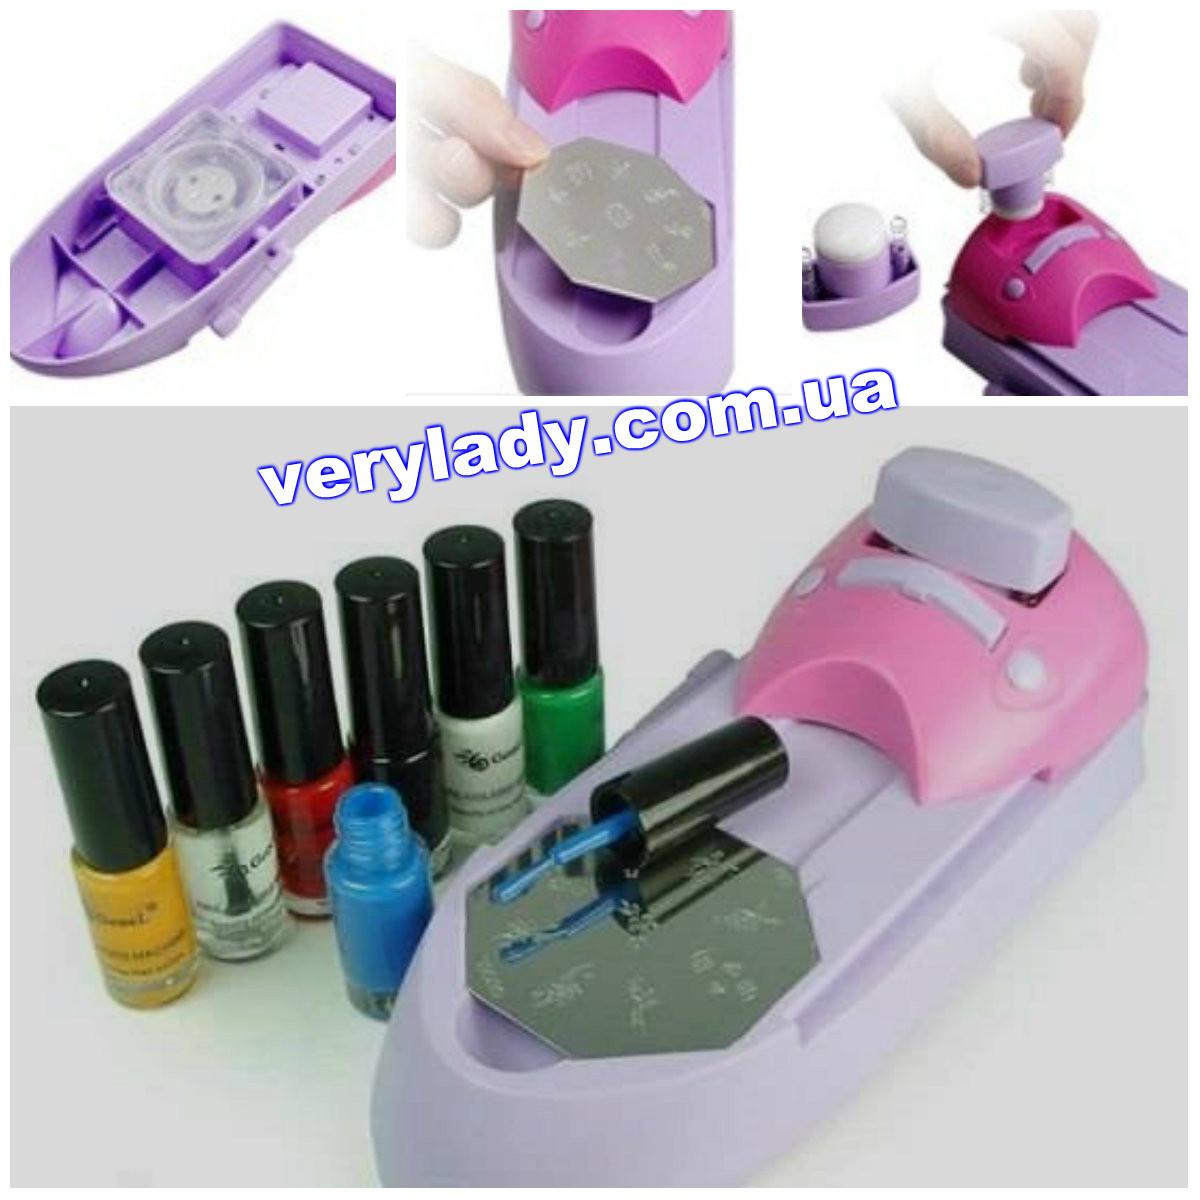 Modern Nail Stamping Machine Gift - Nail Art Ideas - morihati.com